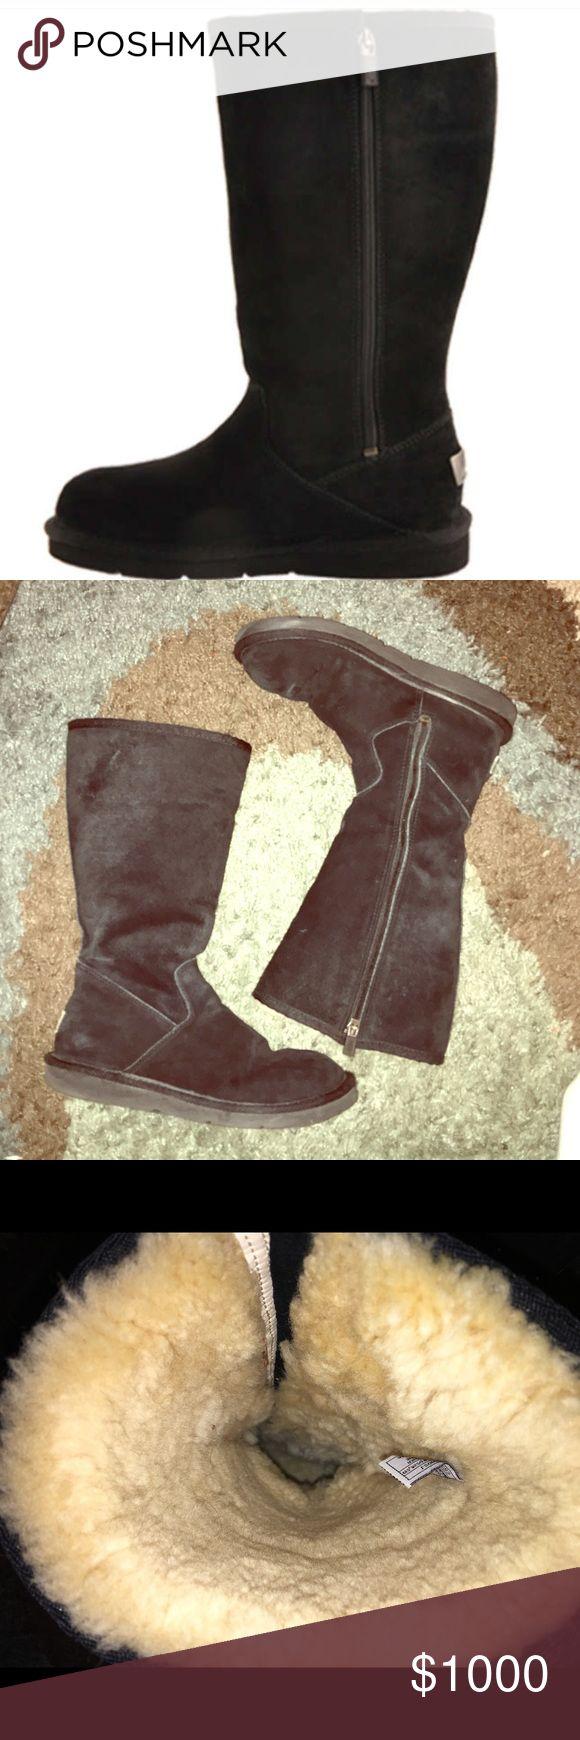 I just added this listing on Poshmark: UGG BLACK BOOTS ZIPPER SIZE 7 🖤🖤🖤🖤🖤✖️⭕️✖️⭕️✖️. #shopmycloset #poshmark #fashion #shopping #style #forsale #UGG #Shoes